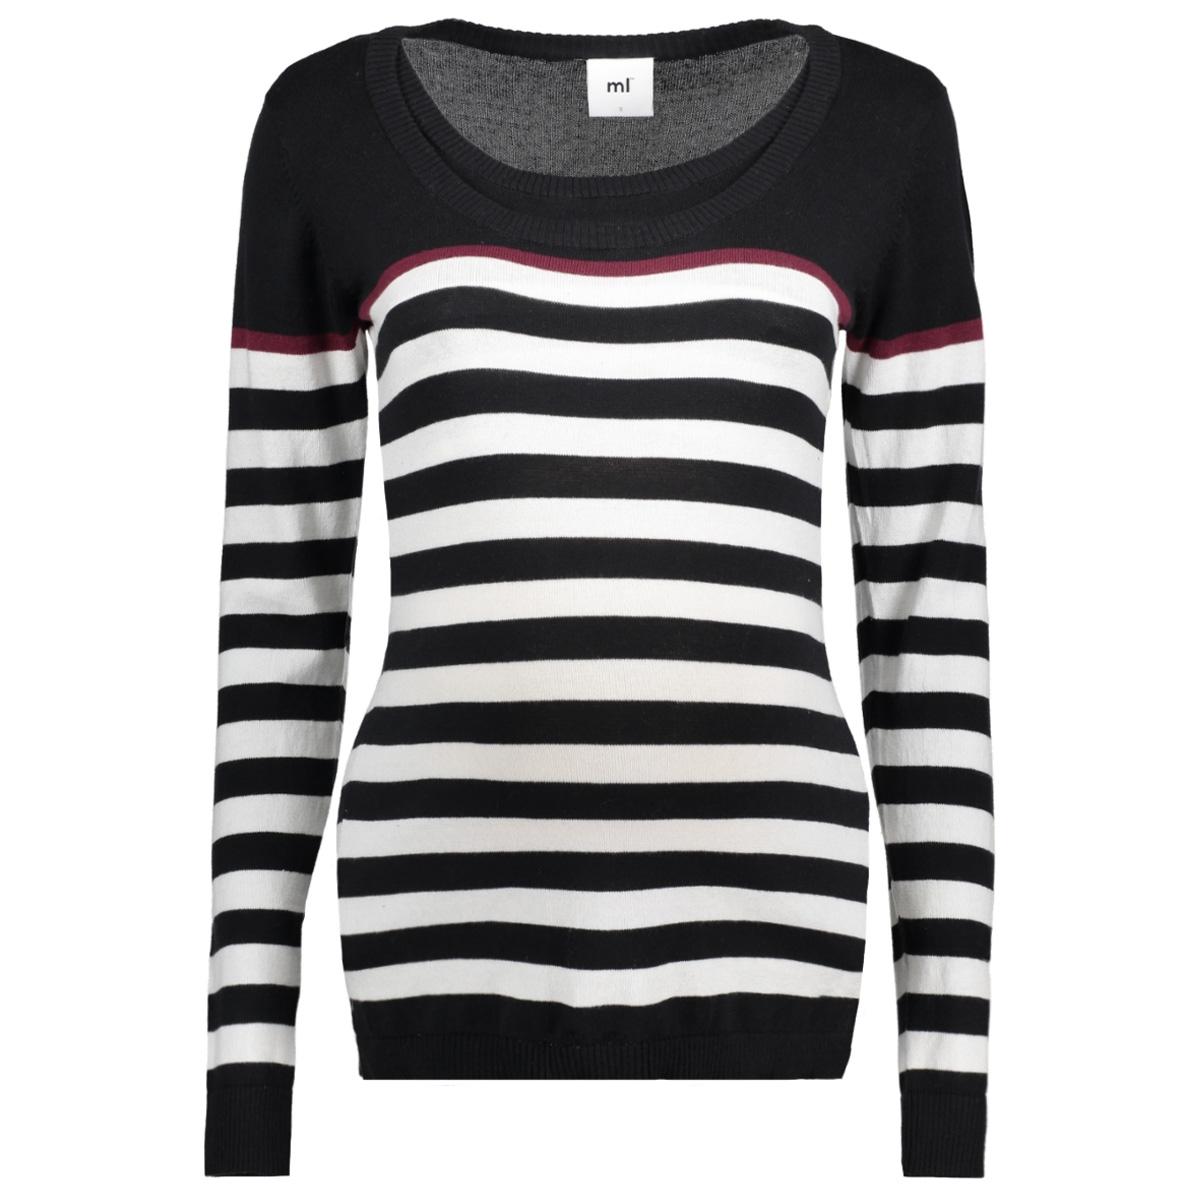 mlanic nell l/s knit blouse nf 20007566 mama-licious positie trui black/snow white